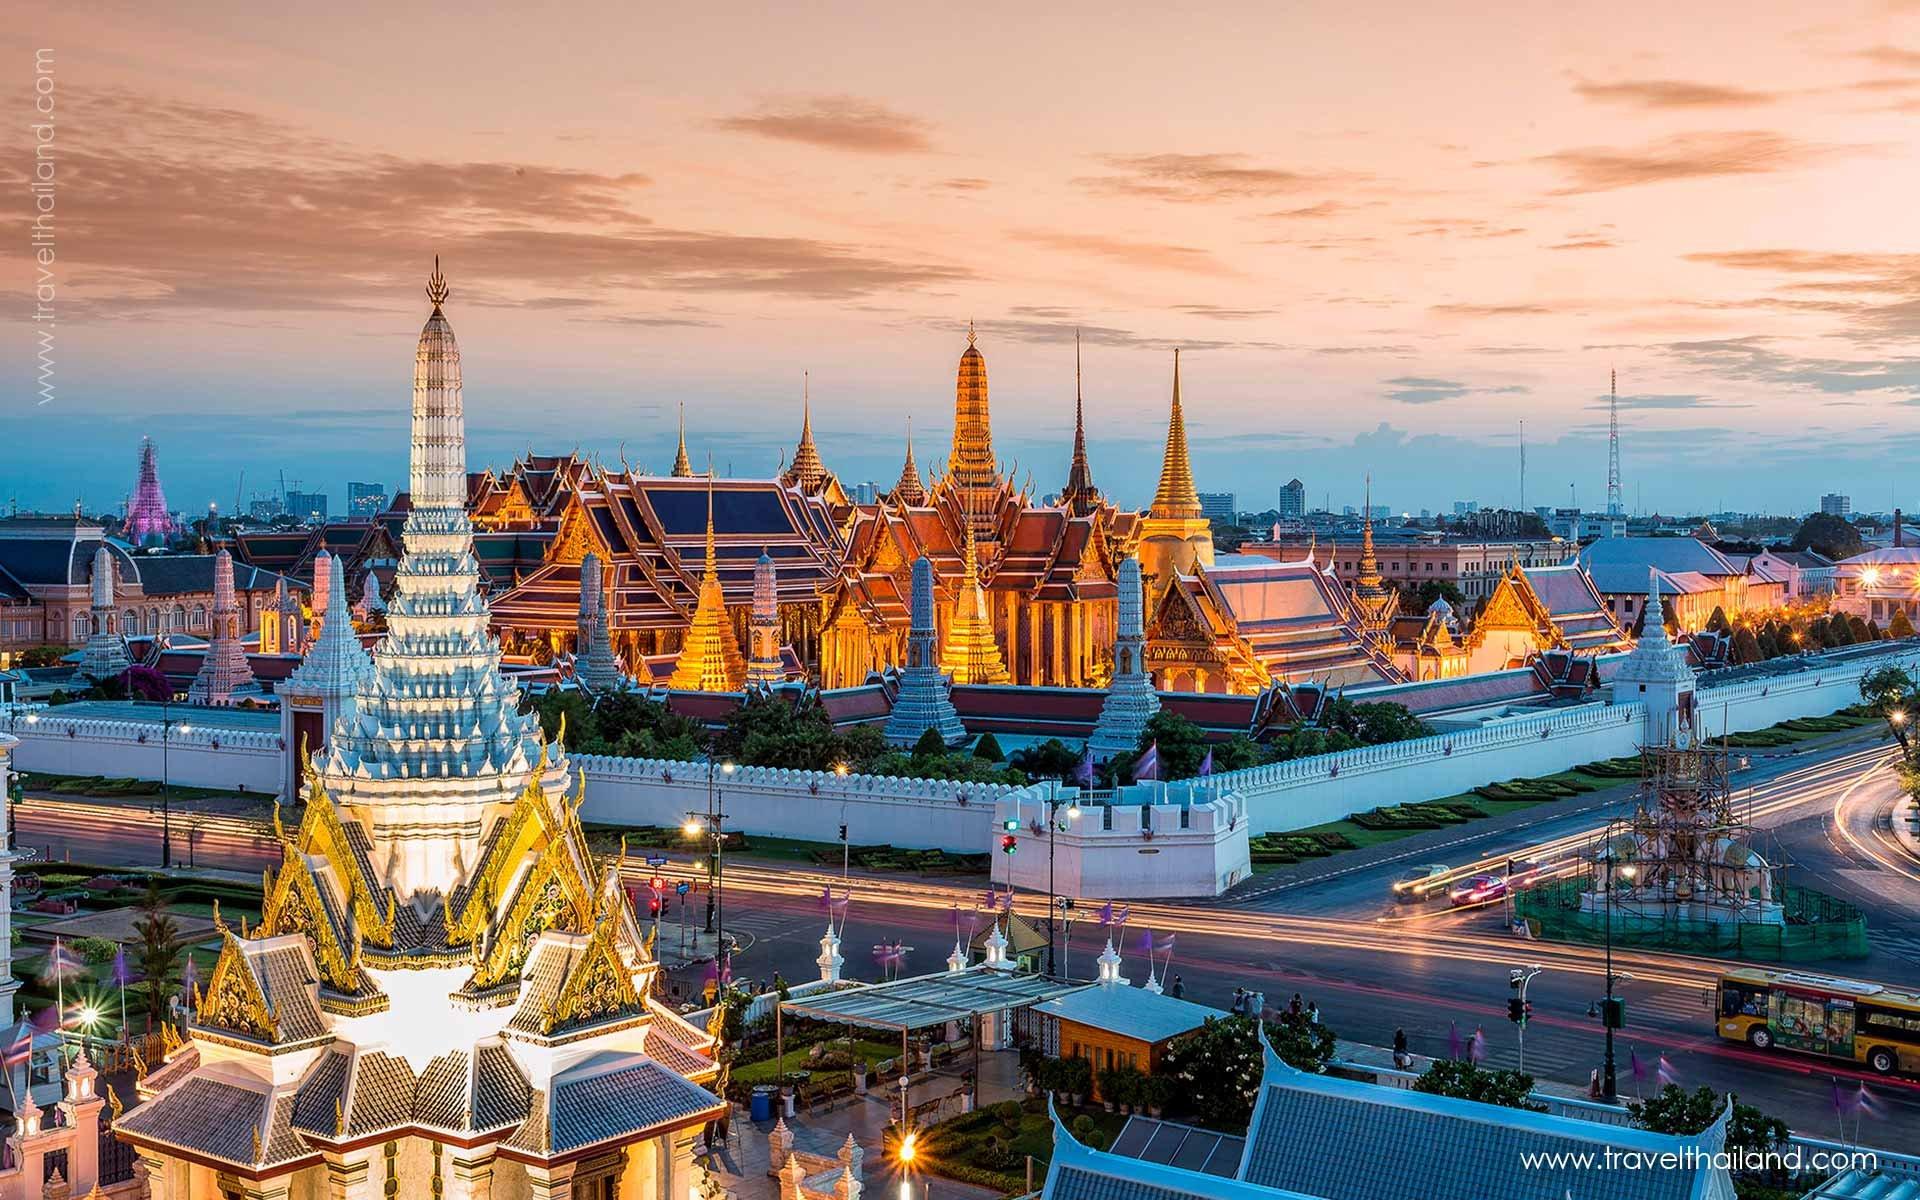 Bangkok & Beach - 7 days